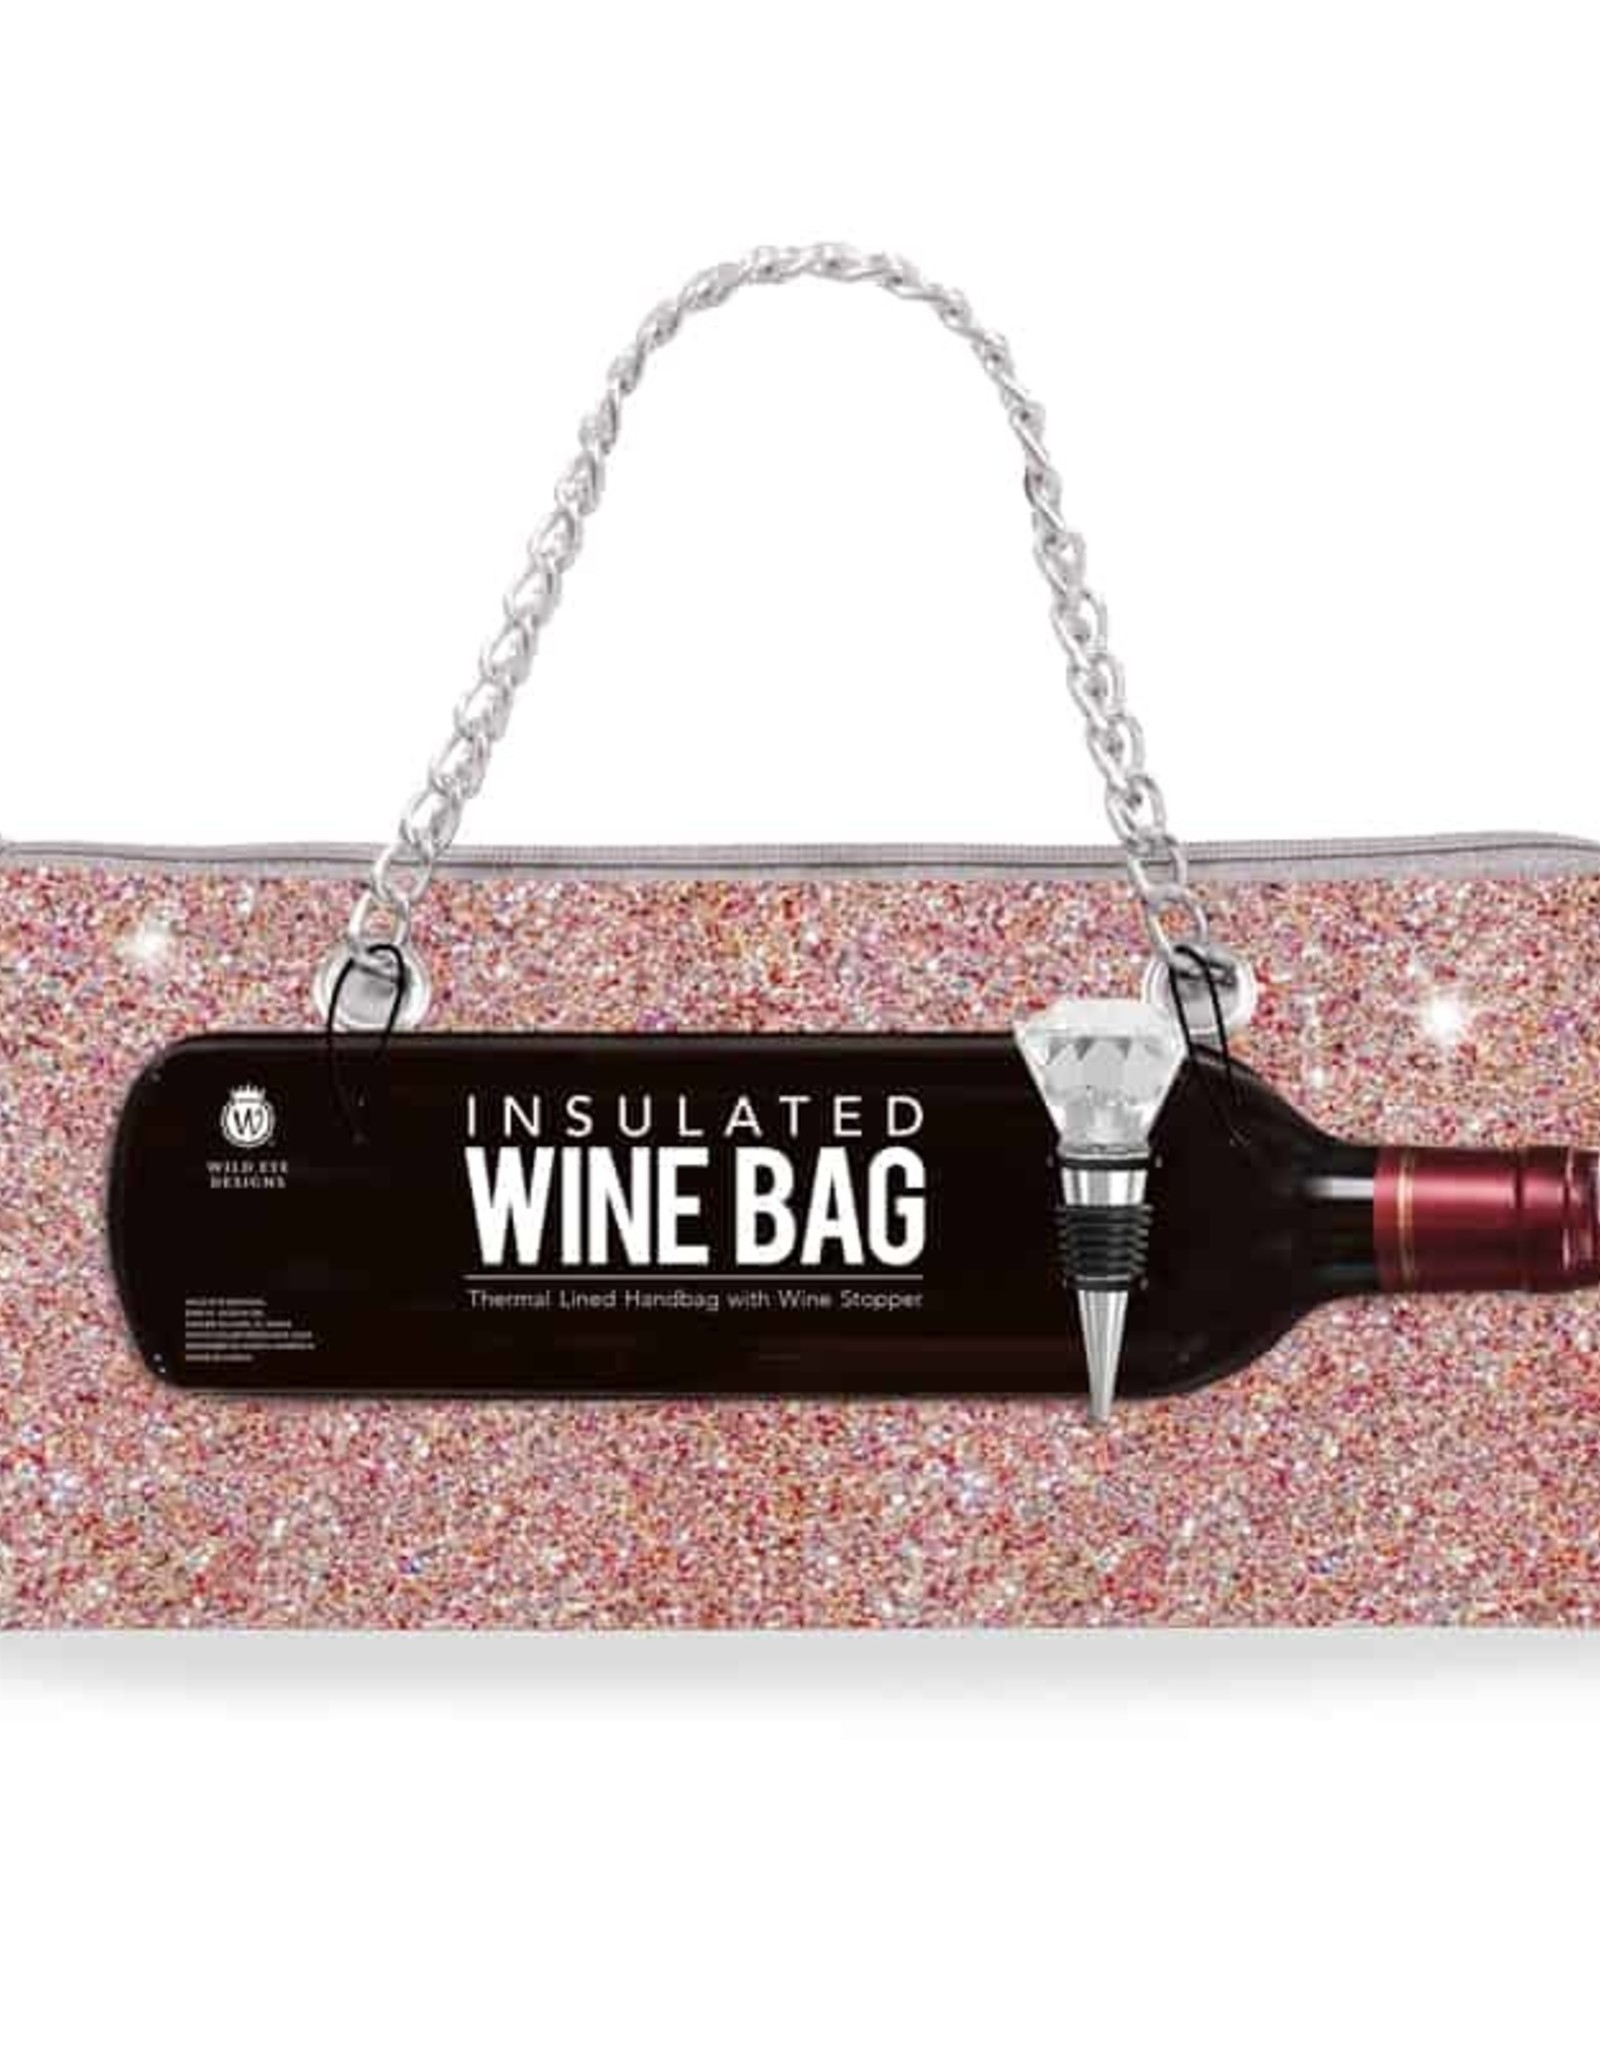 Wild Eye Insulated Wine Bag/Stopper Set - Champagne Confetti